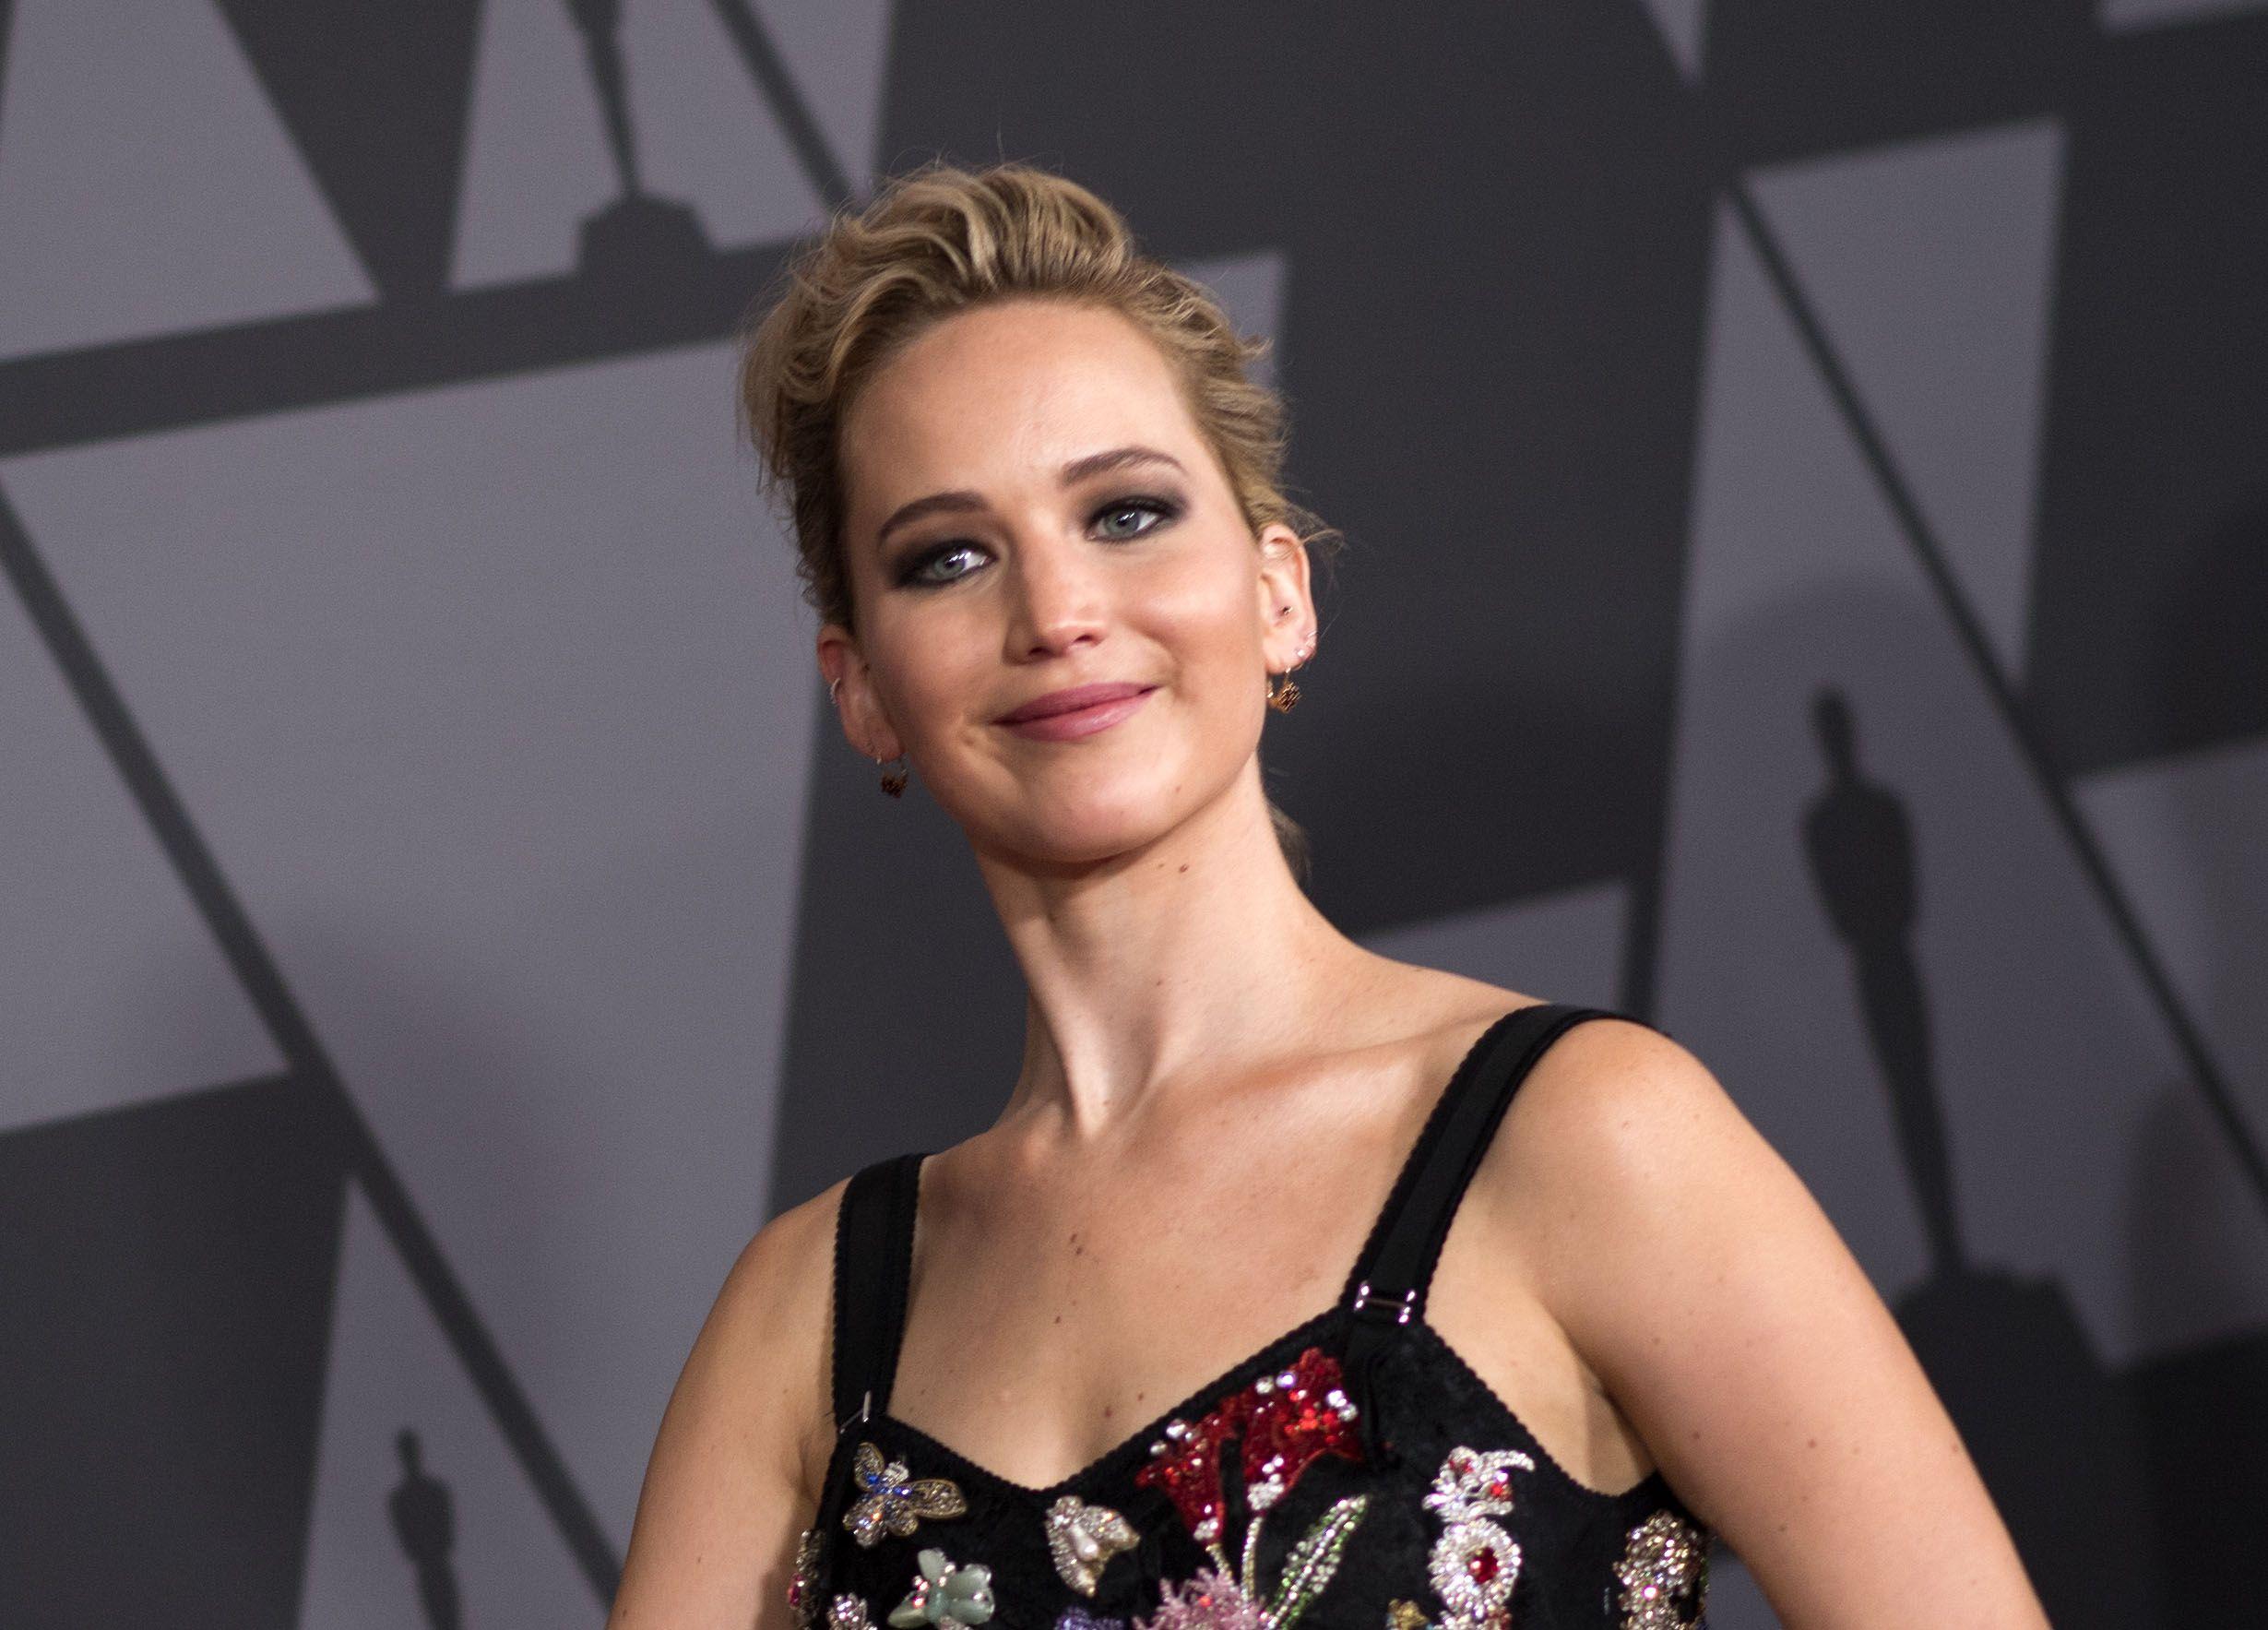 Jennifer Lawrence is an 'asshole', according to Jennifer Lawrence